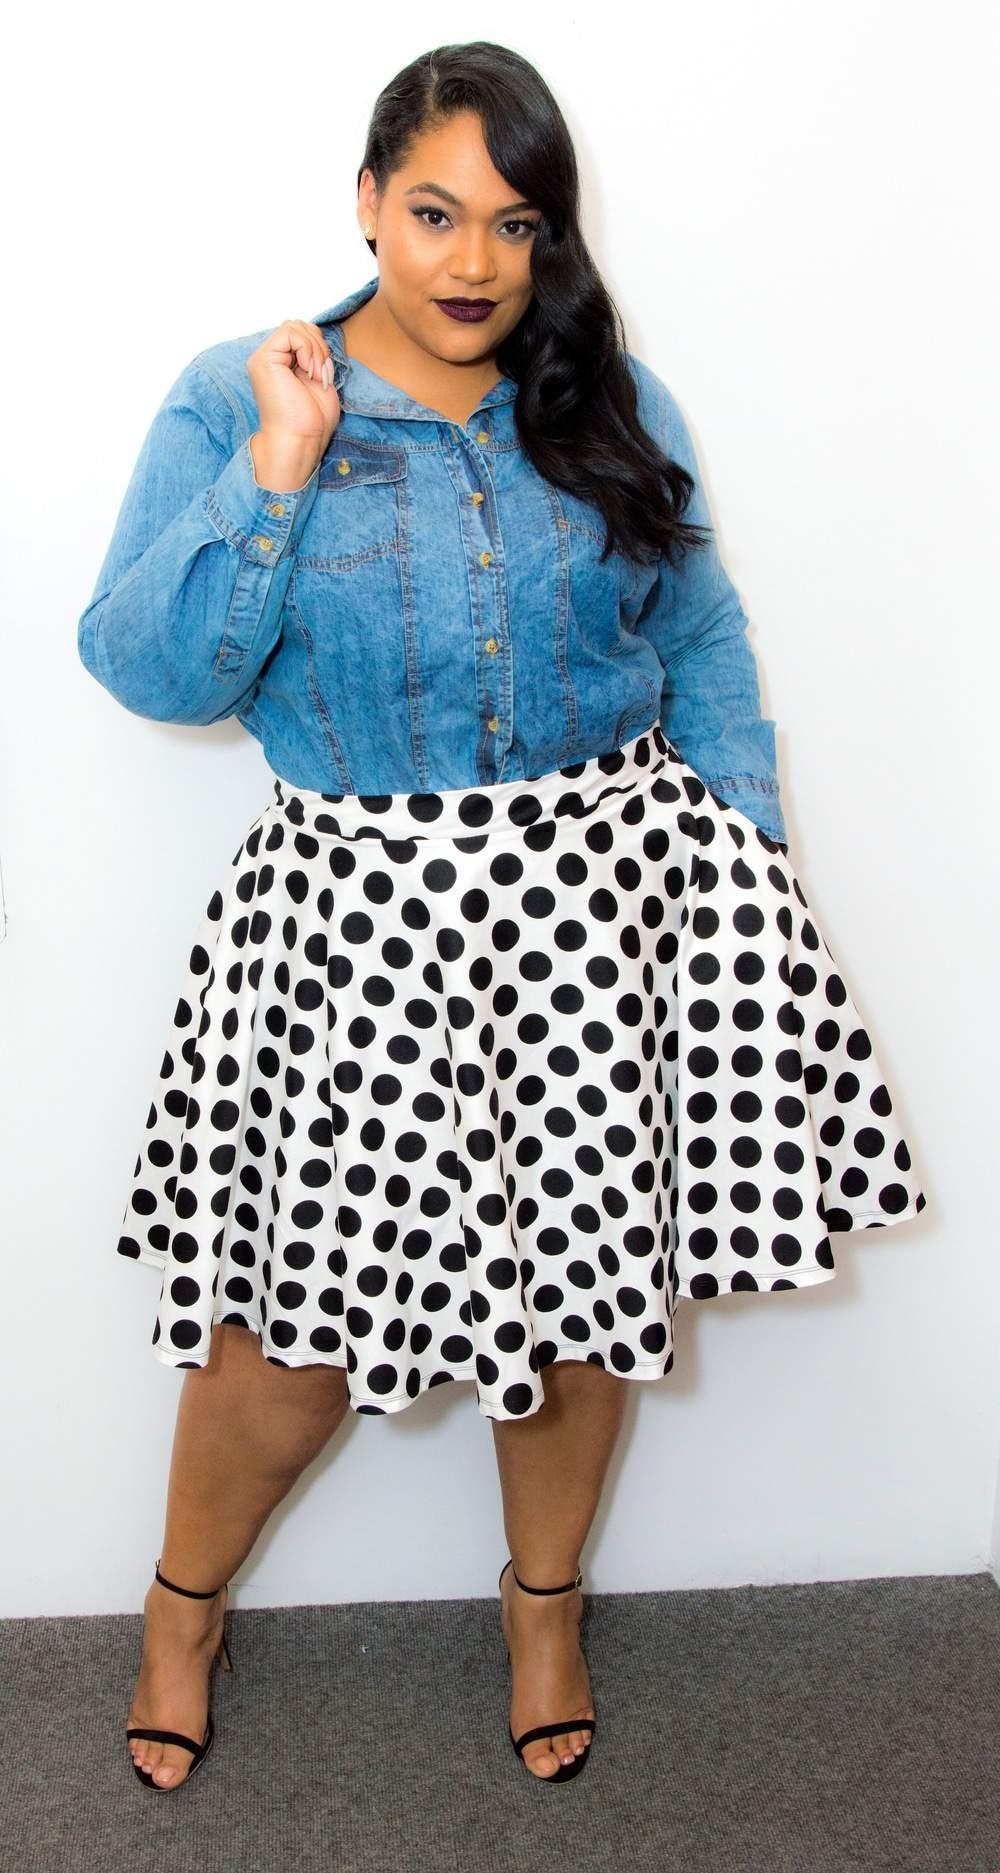 Plus Size Designer- Kay Dupree Polka Dot Skirt